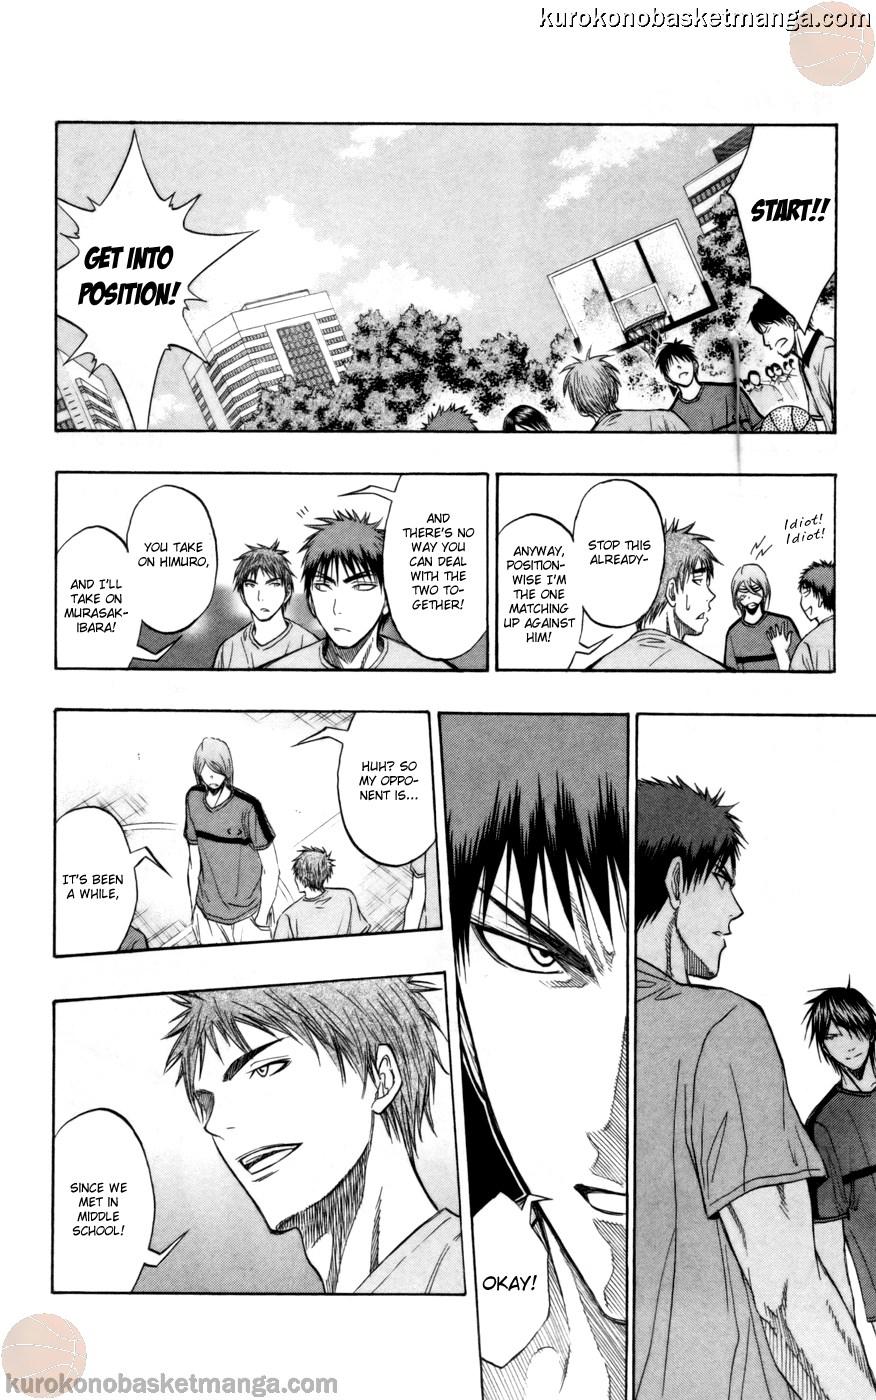 Kuroko no Basket Manga Chapter 78 - Image 12